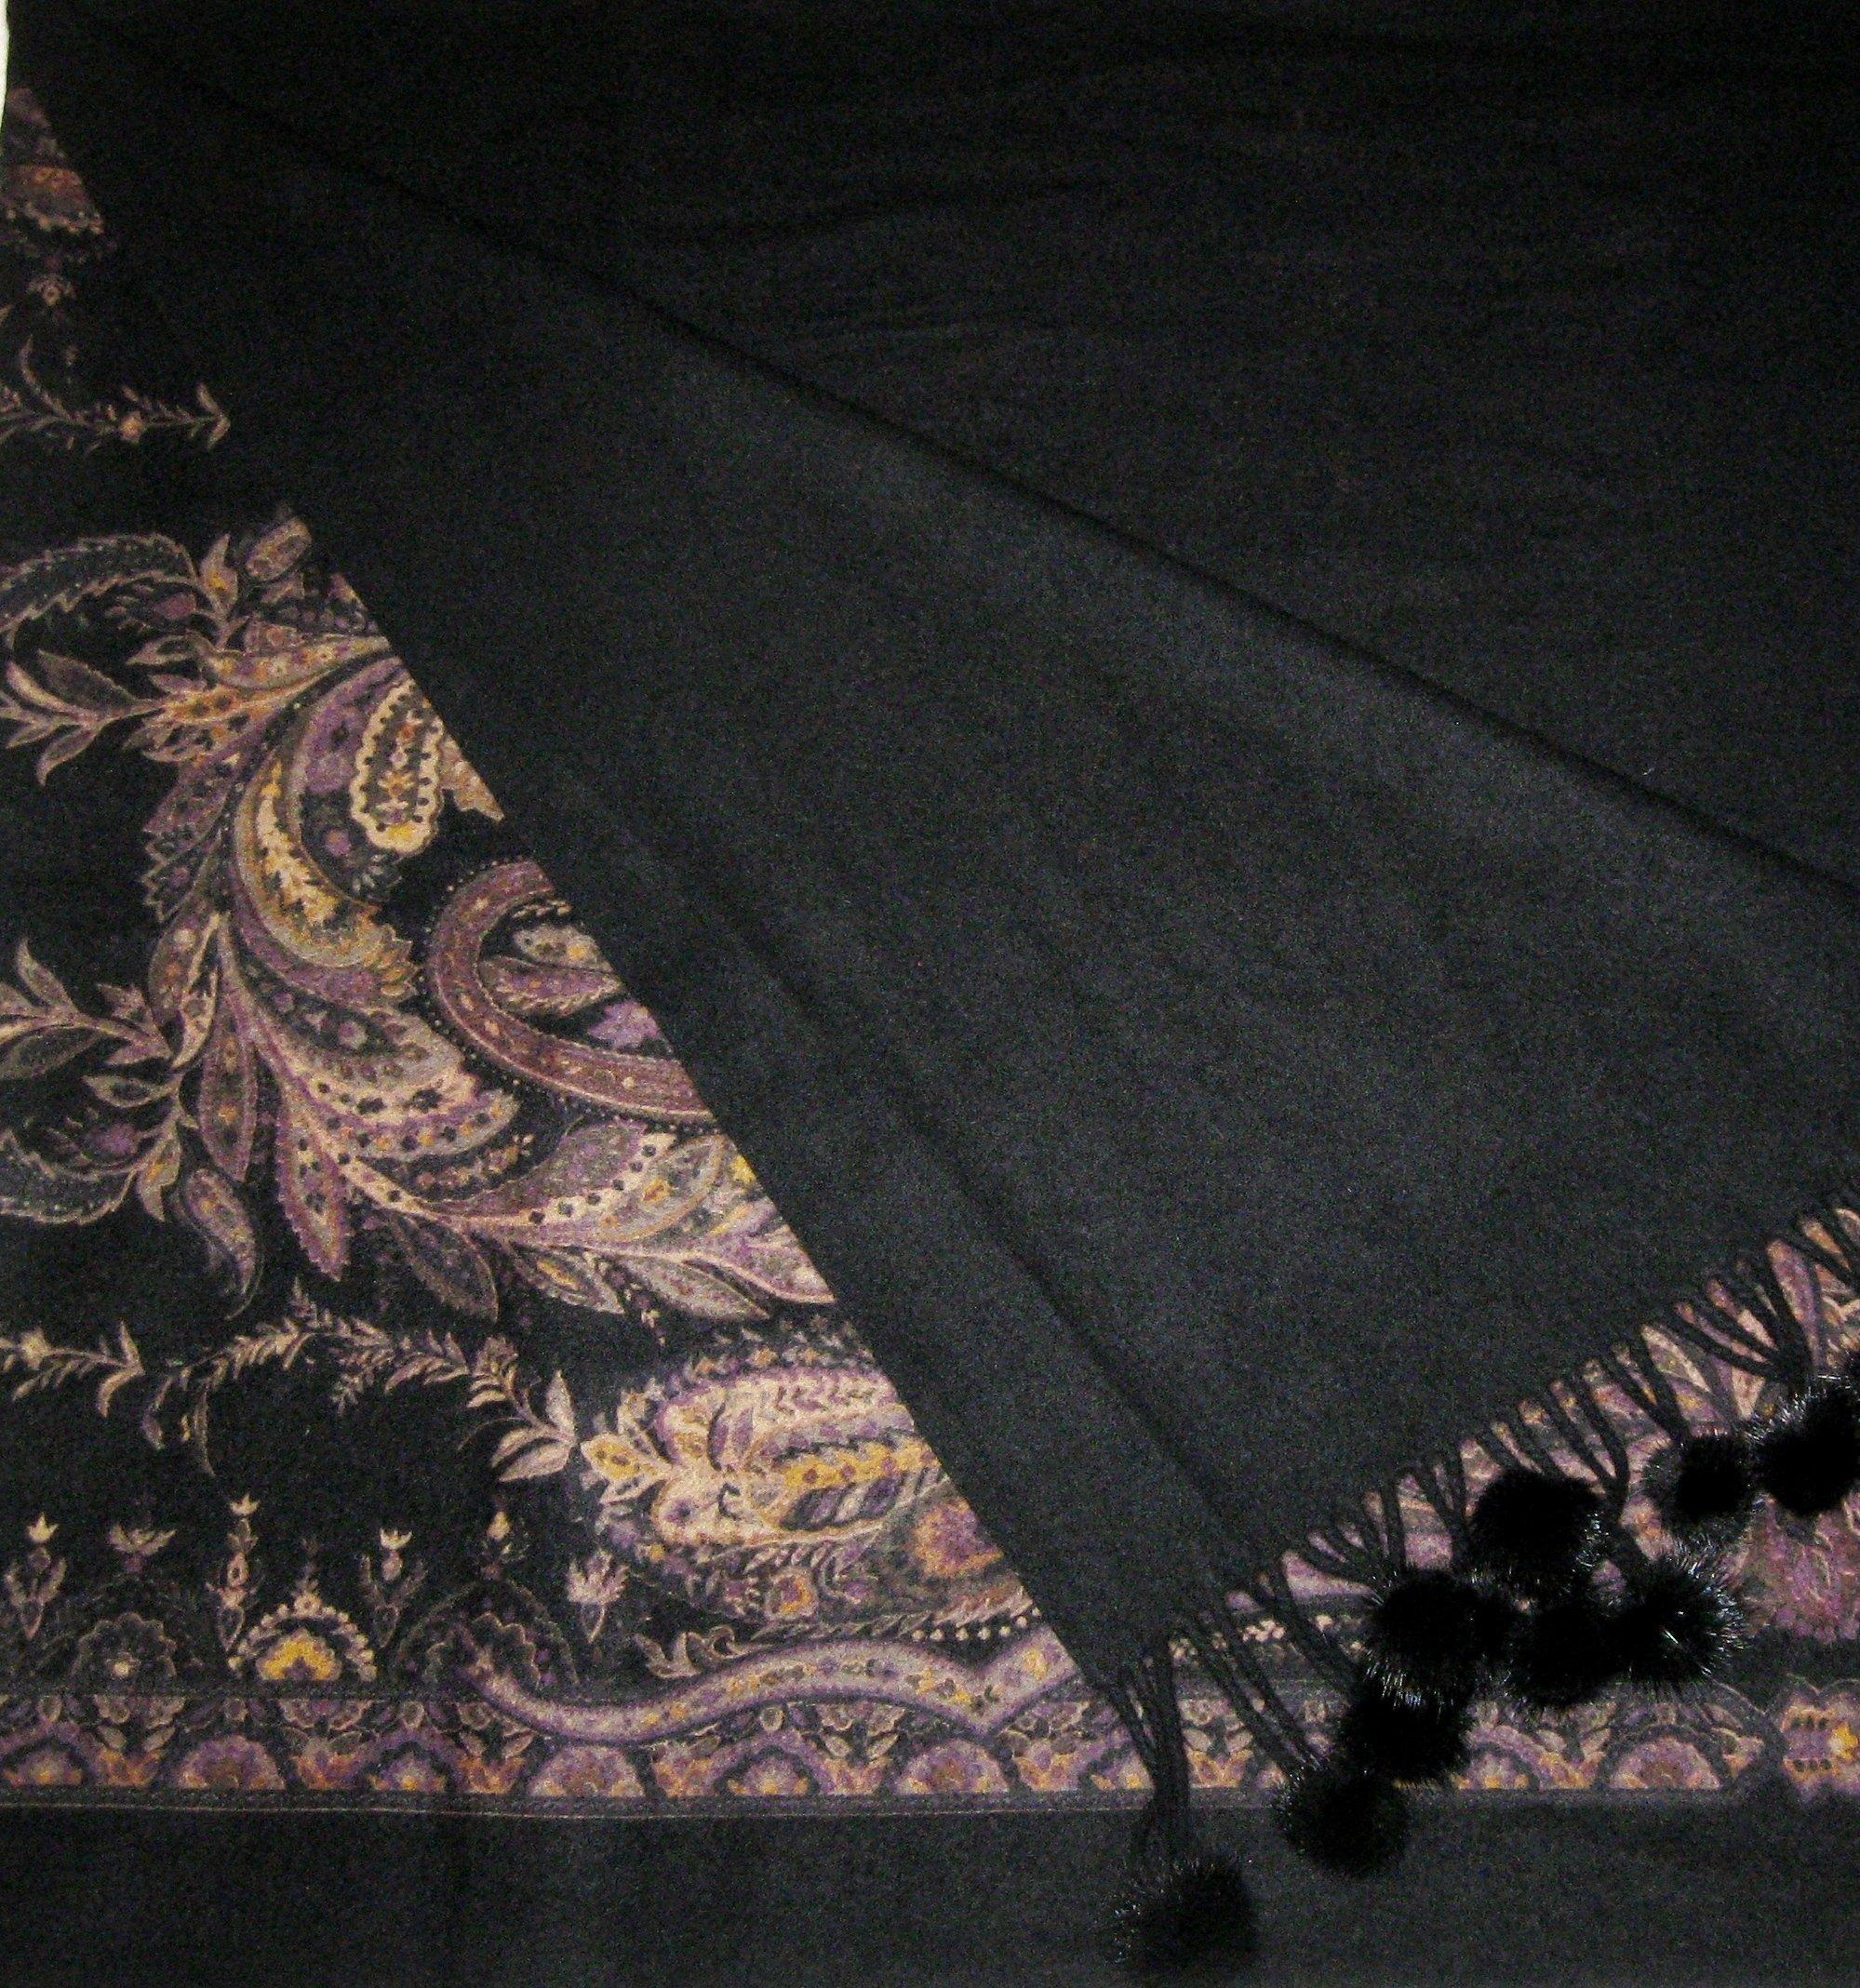 Cashmere Pashmina Group-Cashmere Shawl Scarf Wrap Stole (Solid/ Reversible Print w/ Genuine Fur) - Mink Black by Cashmere Pashmina Group (Image #1)